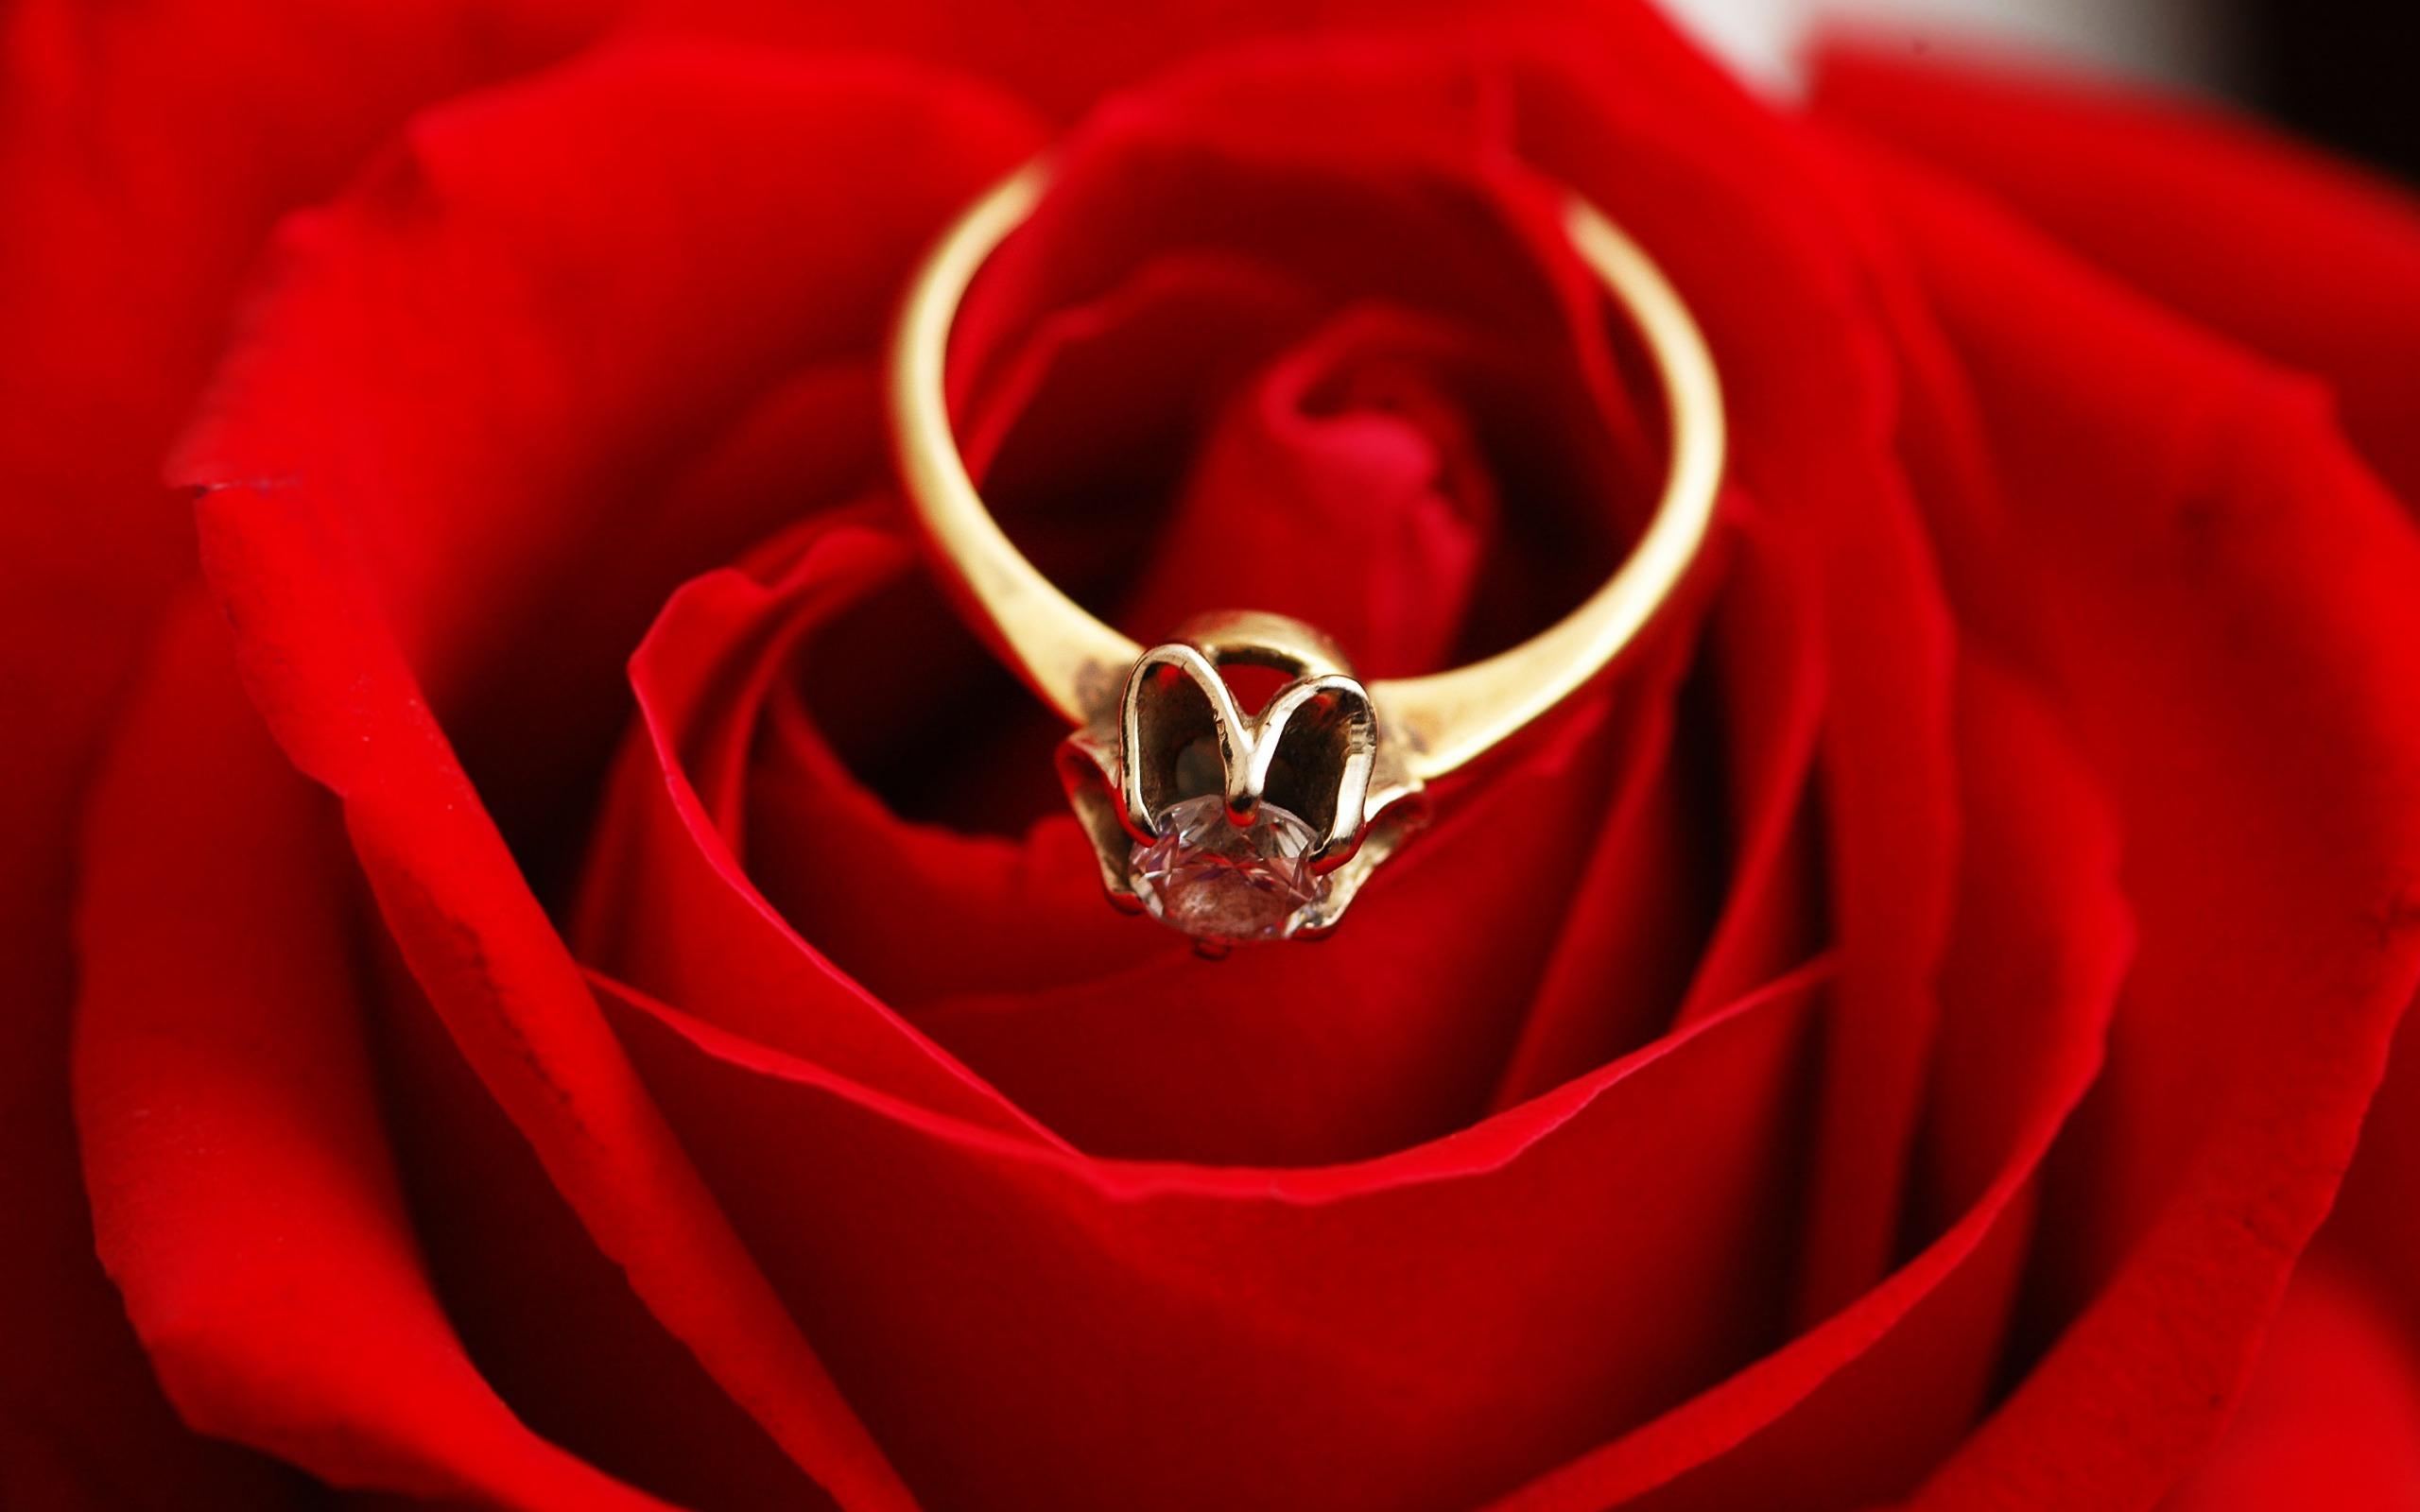 بالصور خلفيات زواج , صور خلفيات مميزه لا مثيل لها لاجمل عروسين 3626 8